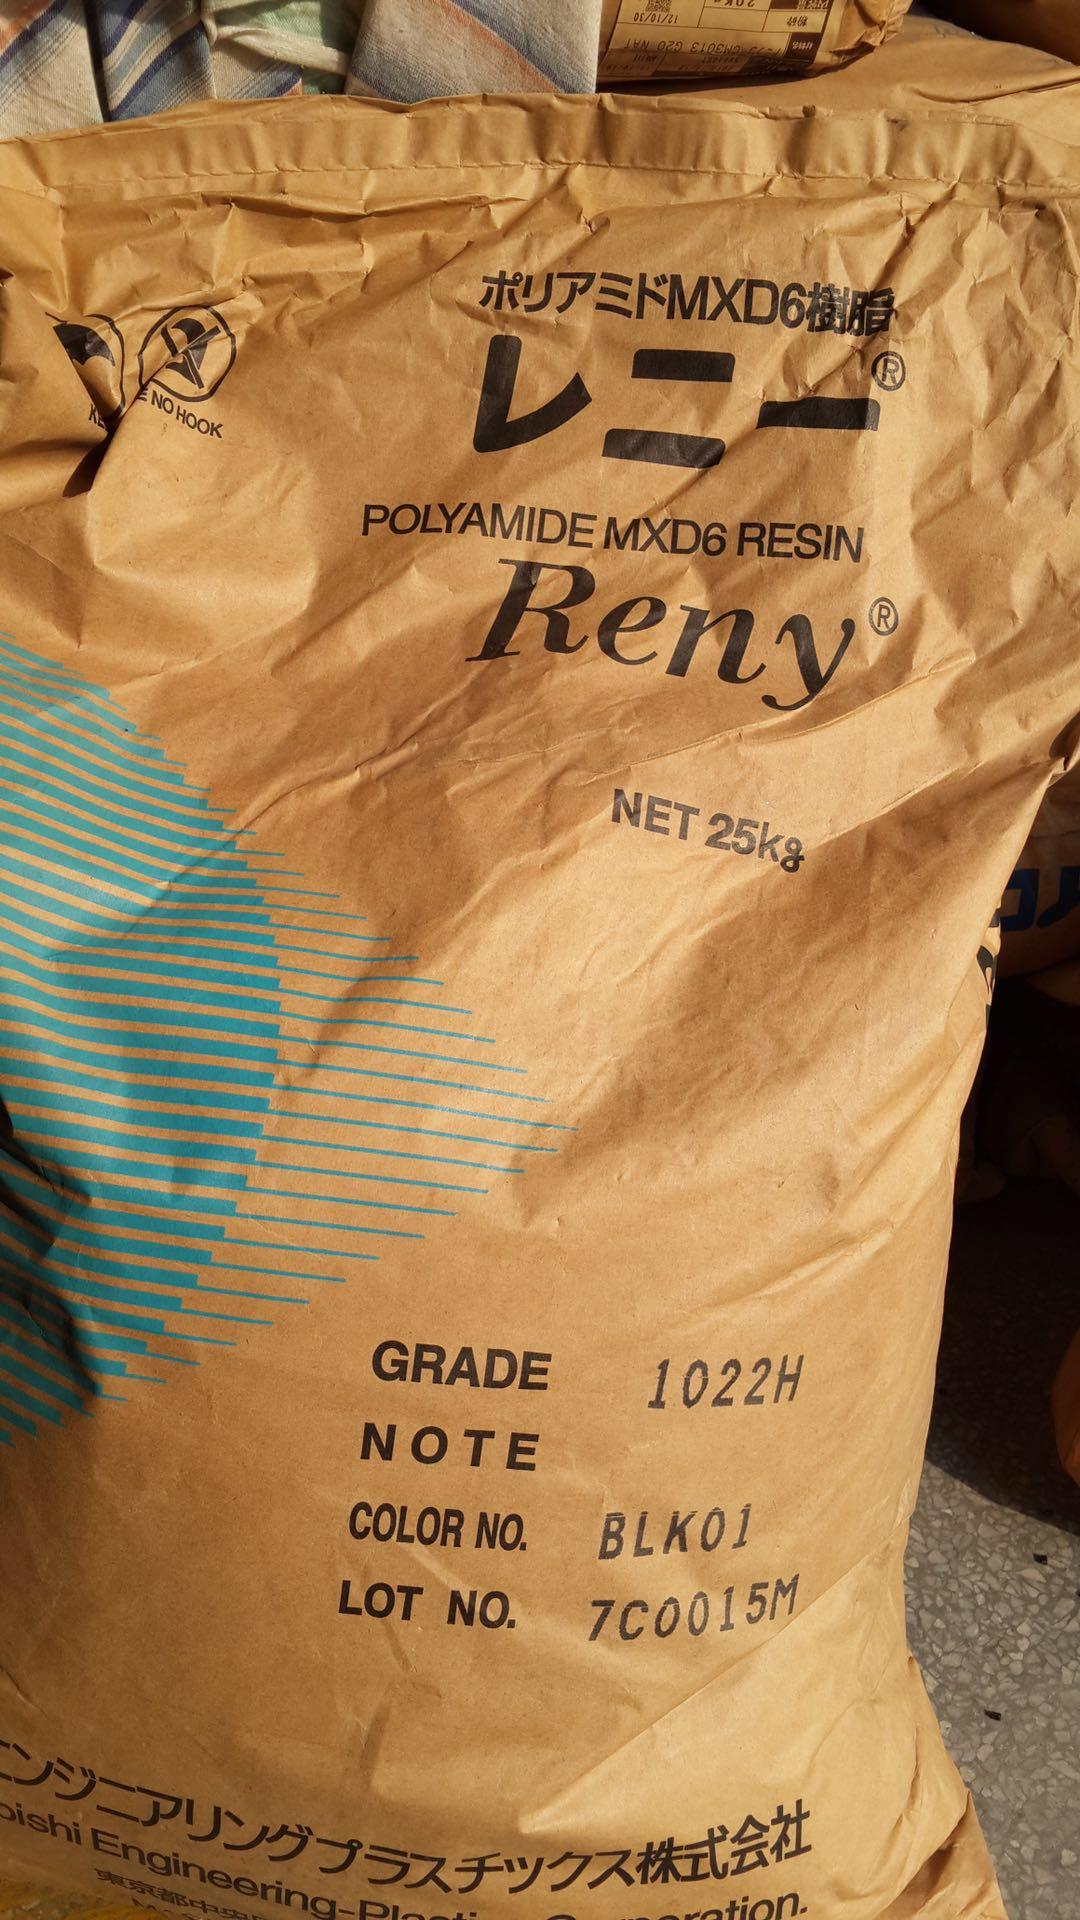 PAMXD6 RENY 1022H-BLK01